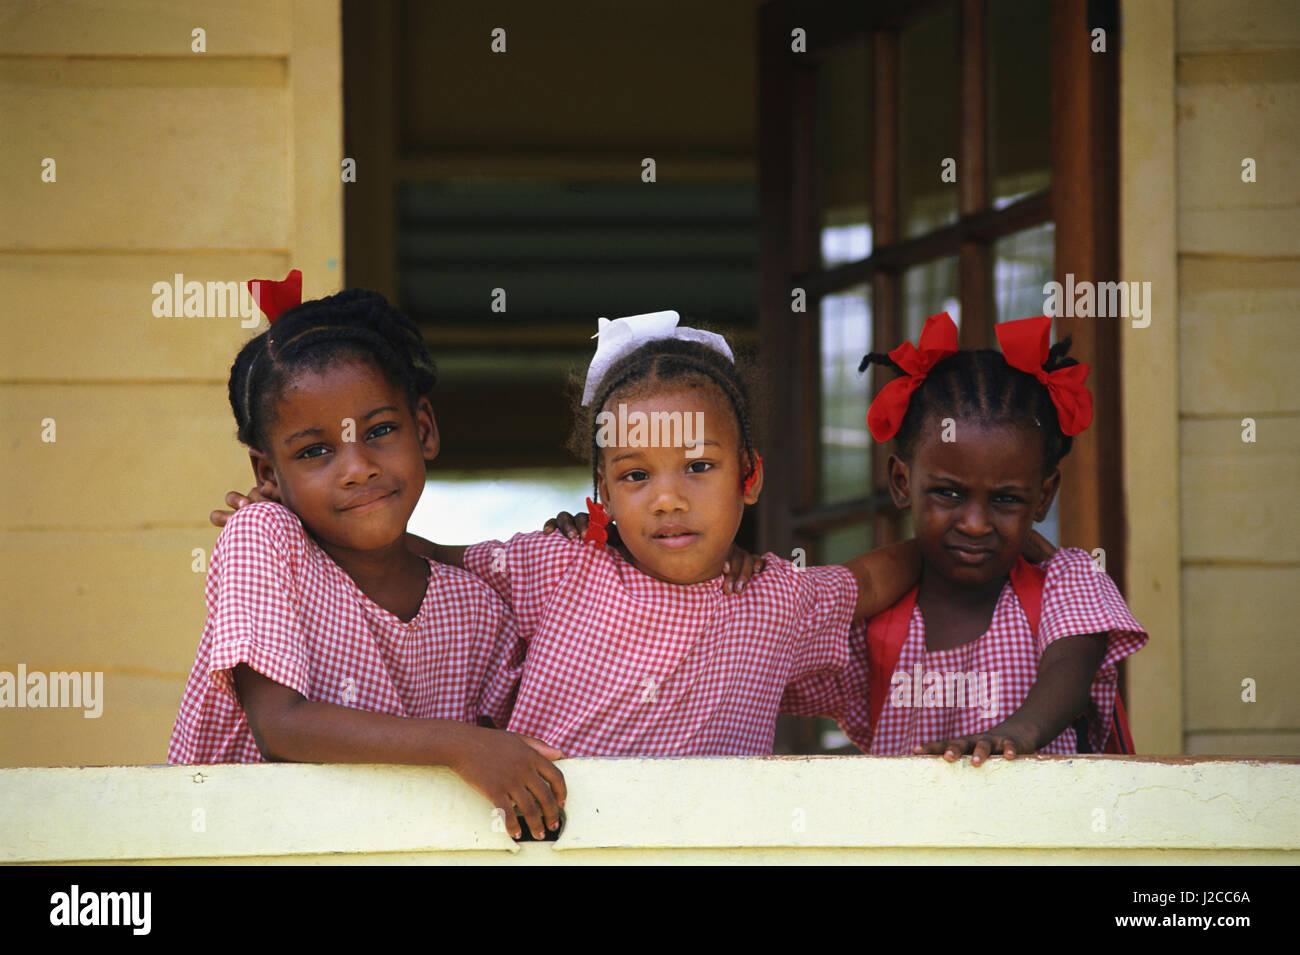 trinidad-young-girls